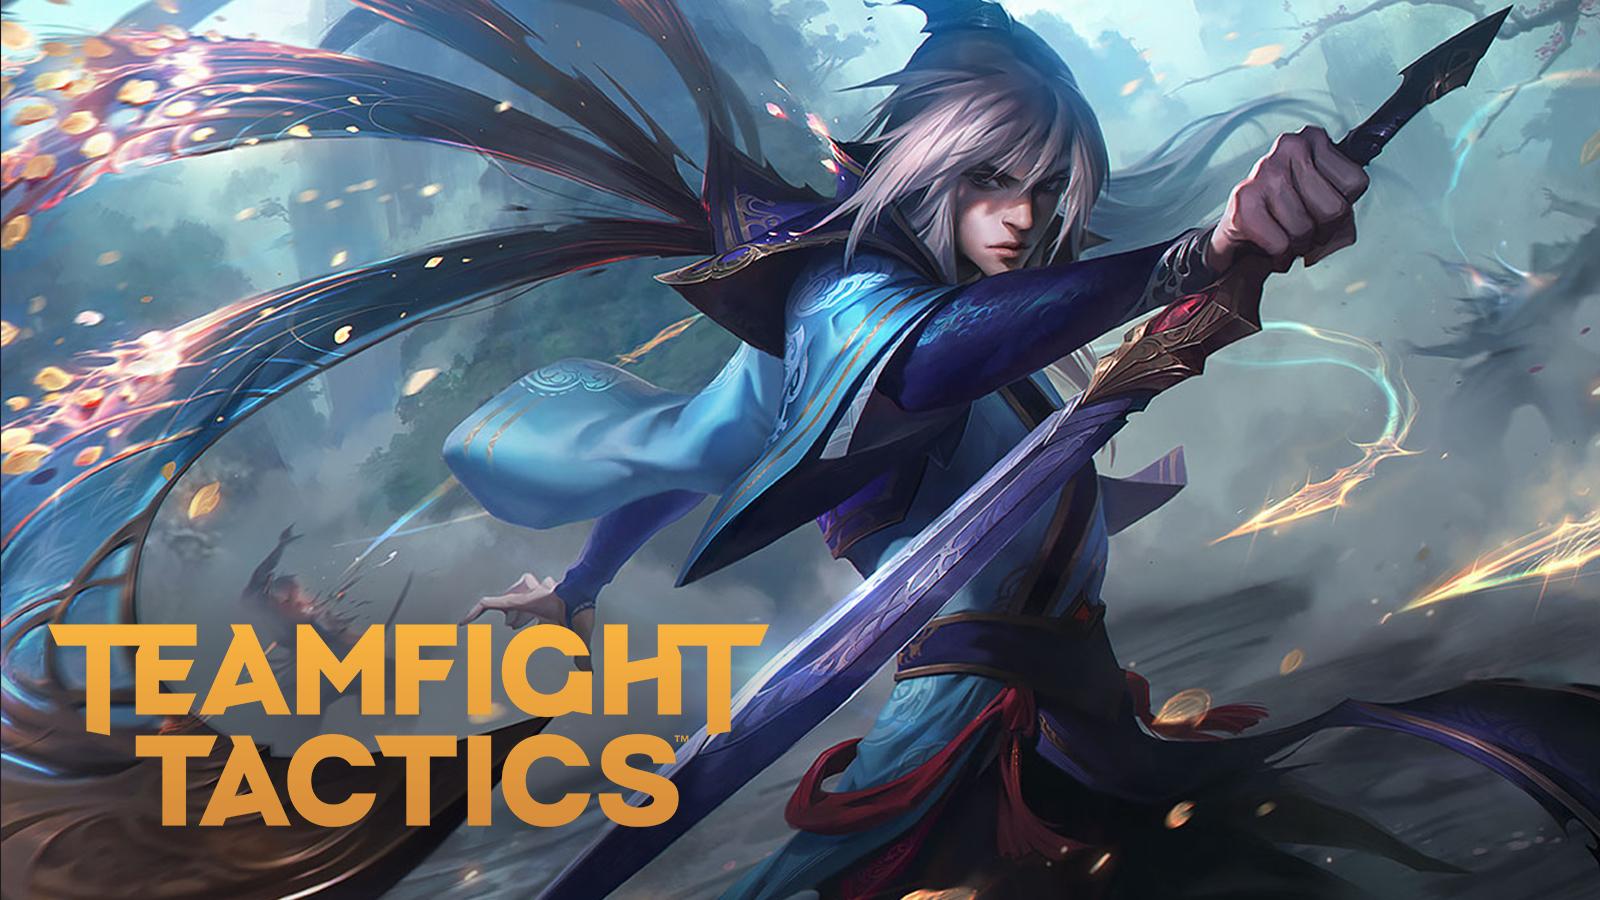 Talon standing over the Teamfight Tactics patch 10.24 logo.